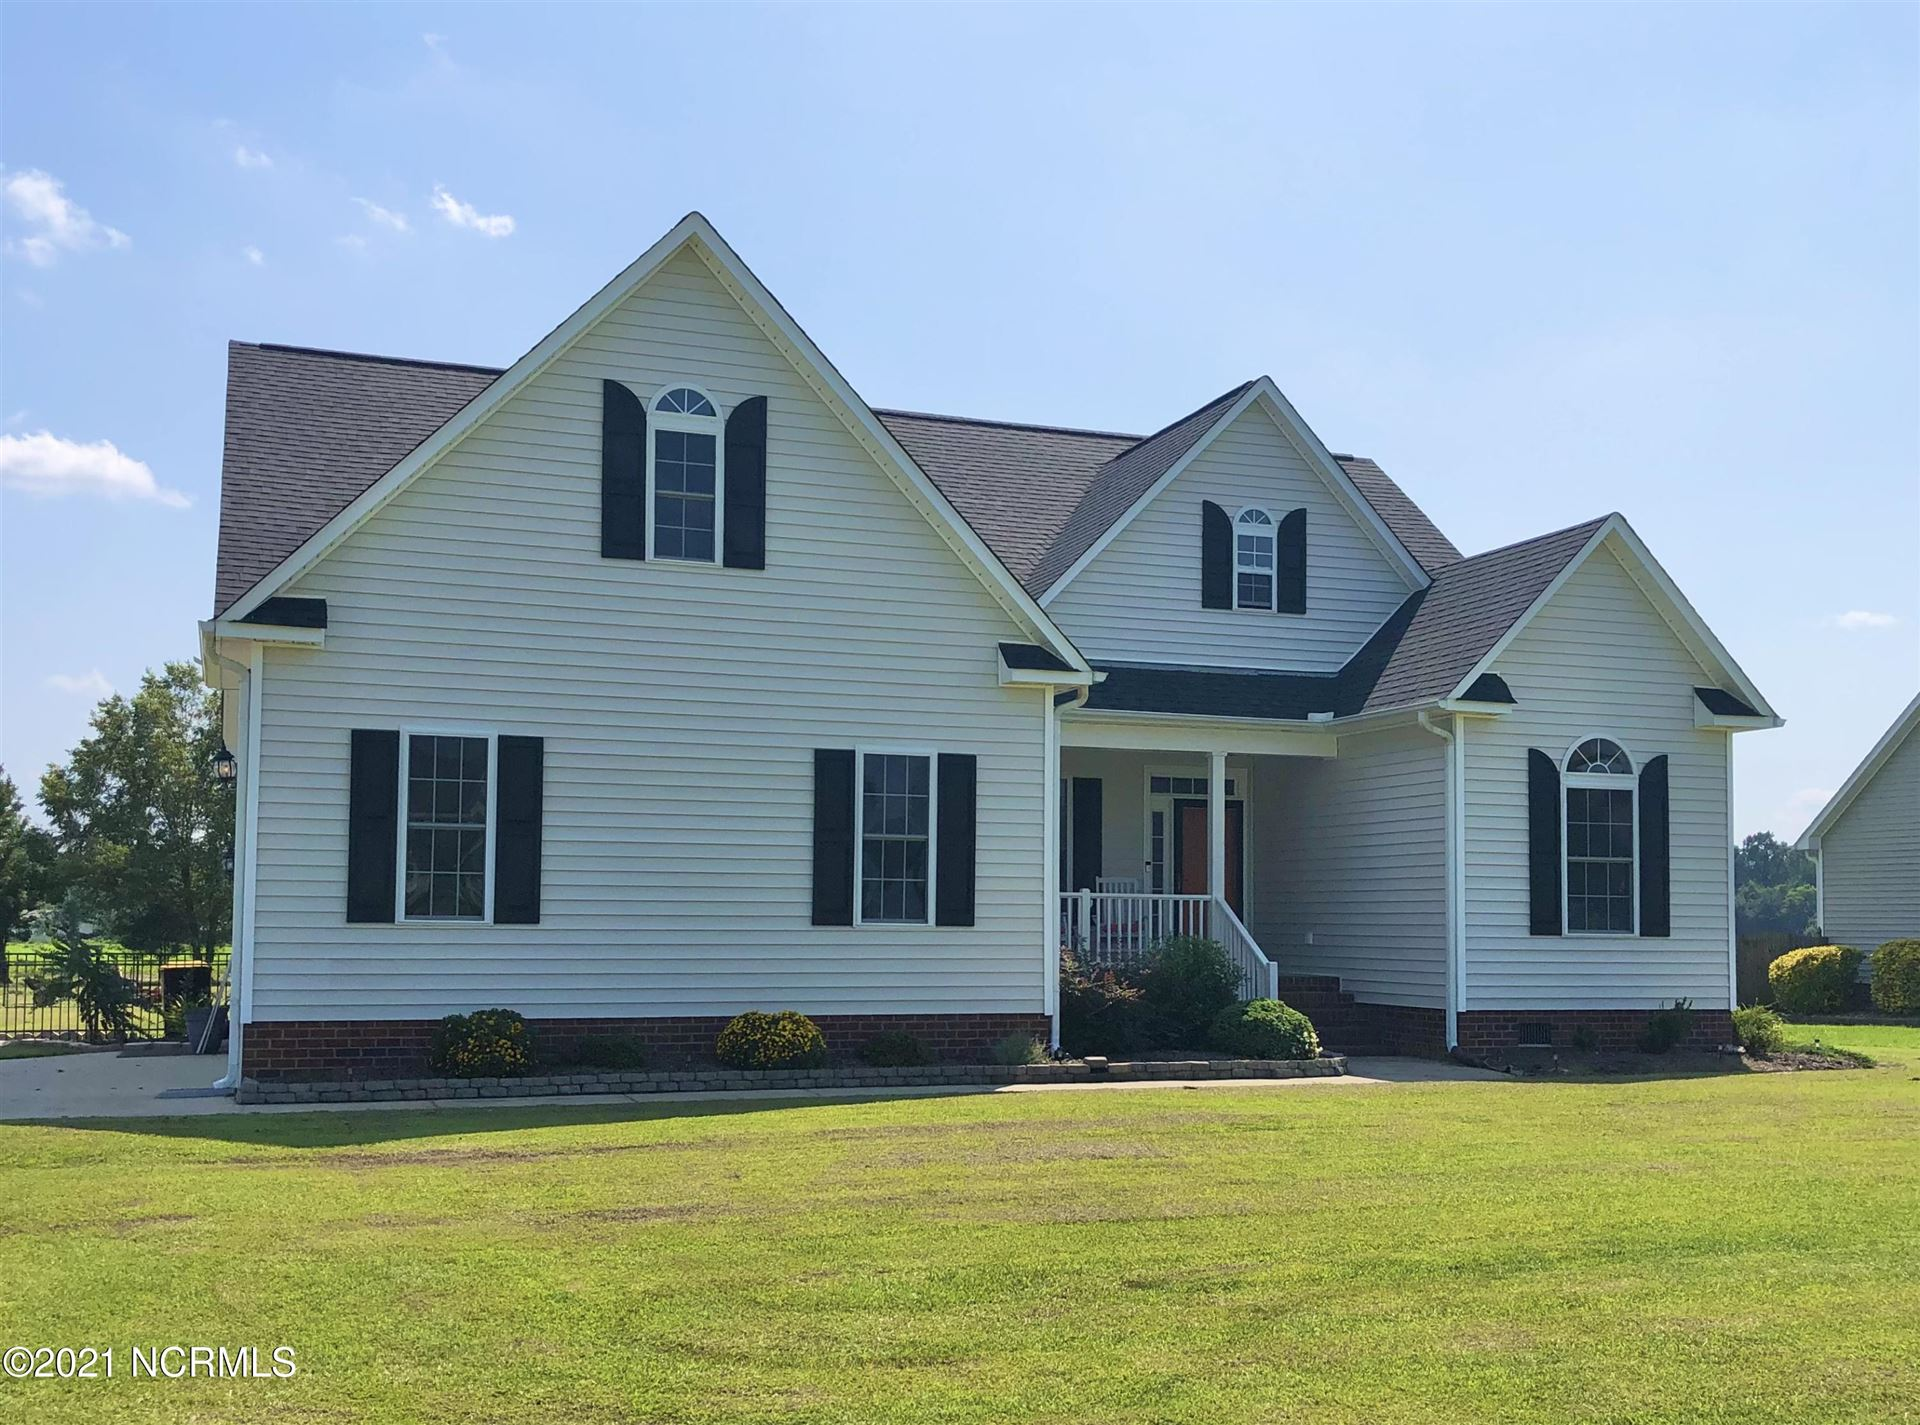 Photo of 461 Brevard Road, Winterville, NC 28590 (MLS # 100286391)